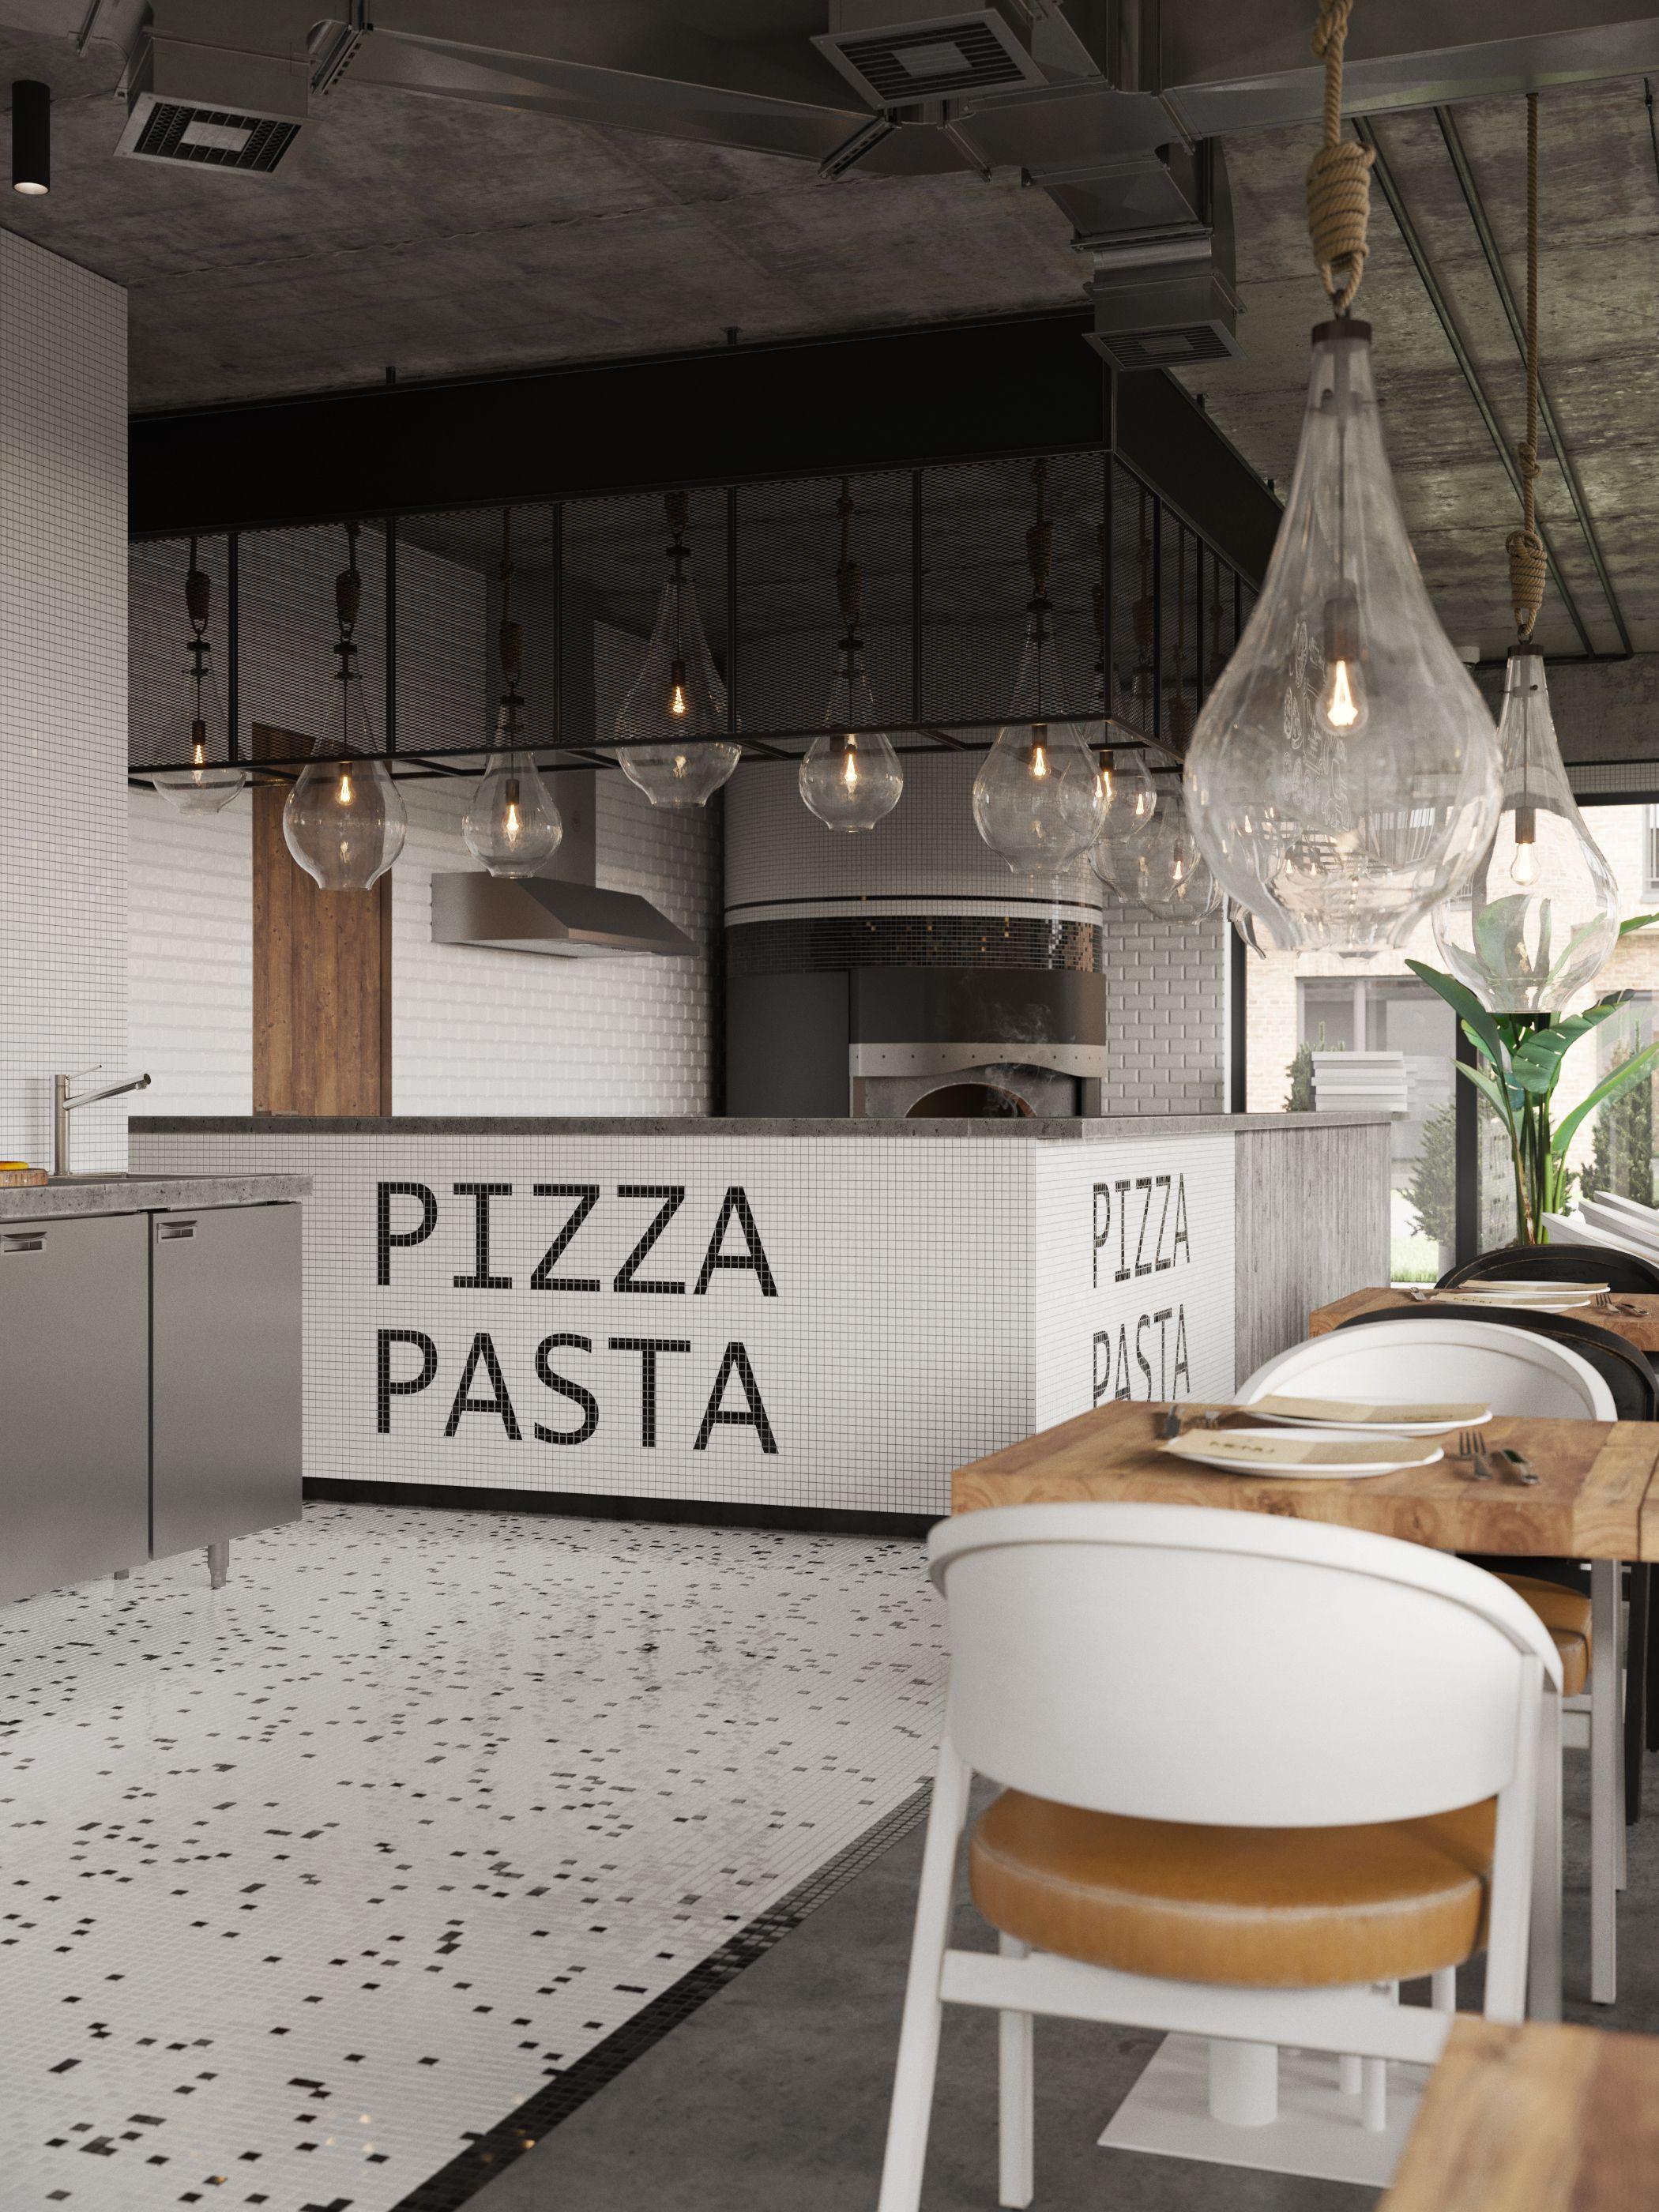 Contemporary Pizza Pasta Restaurant In Almaty Kazakhst On Behance